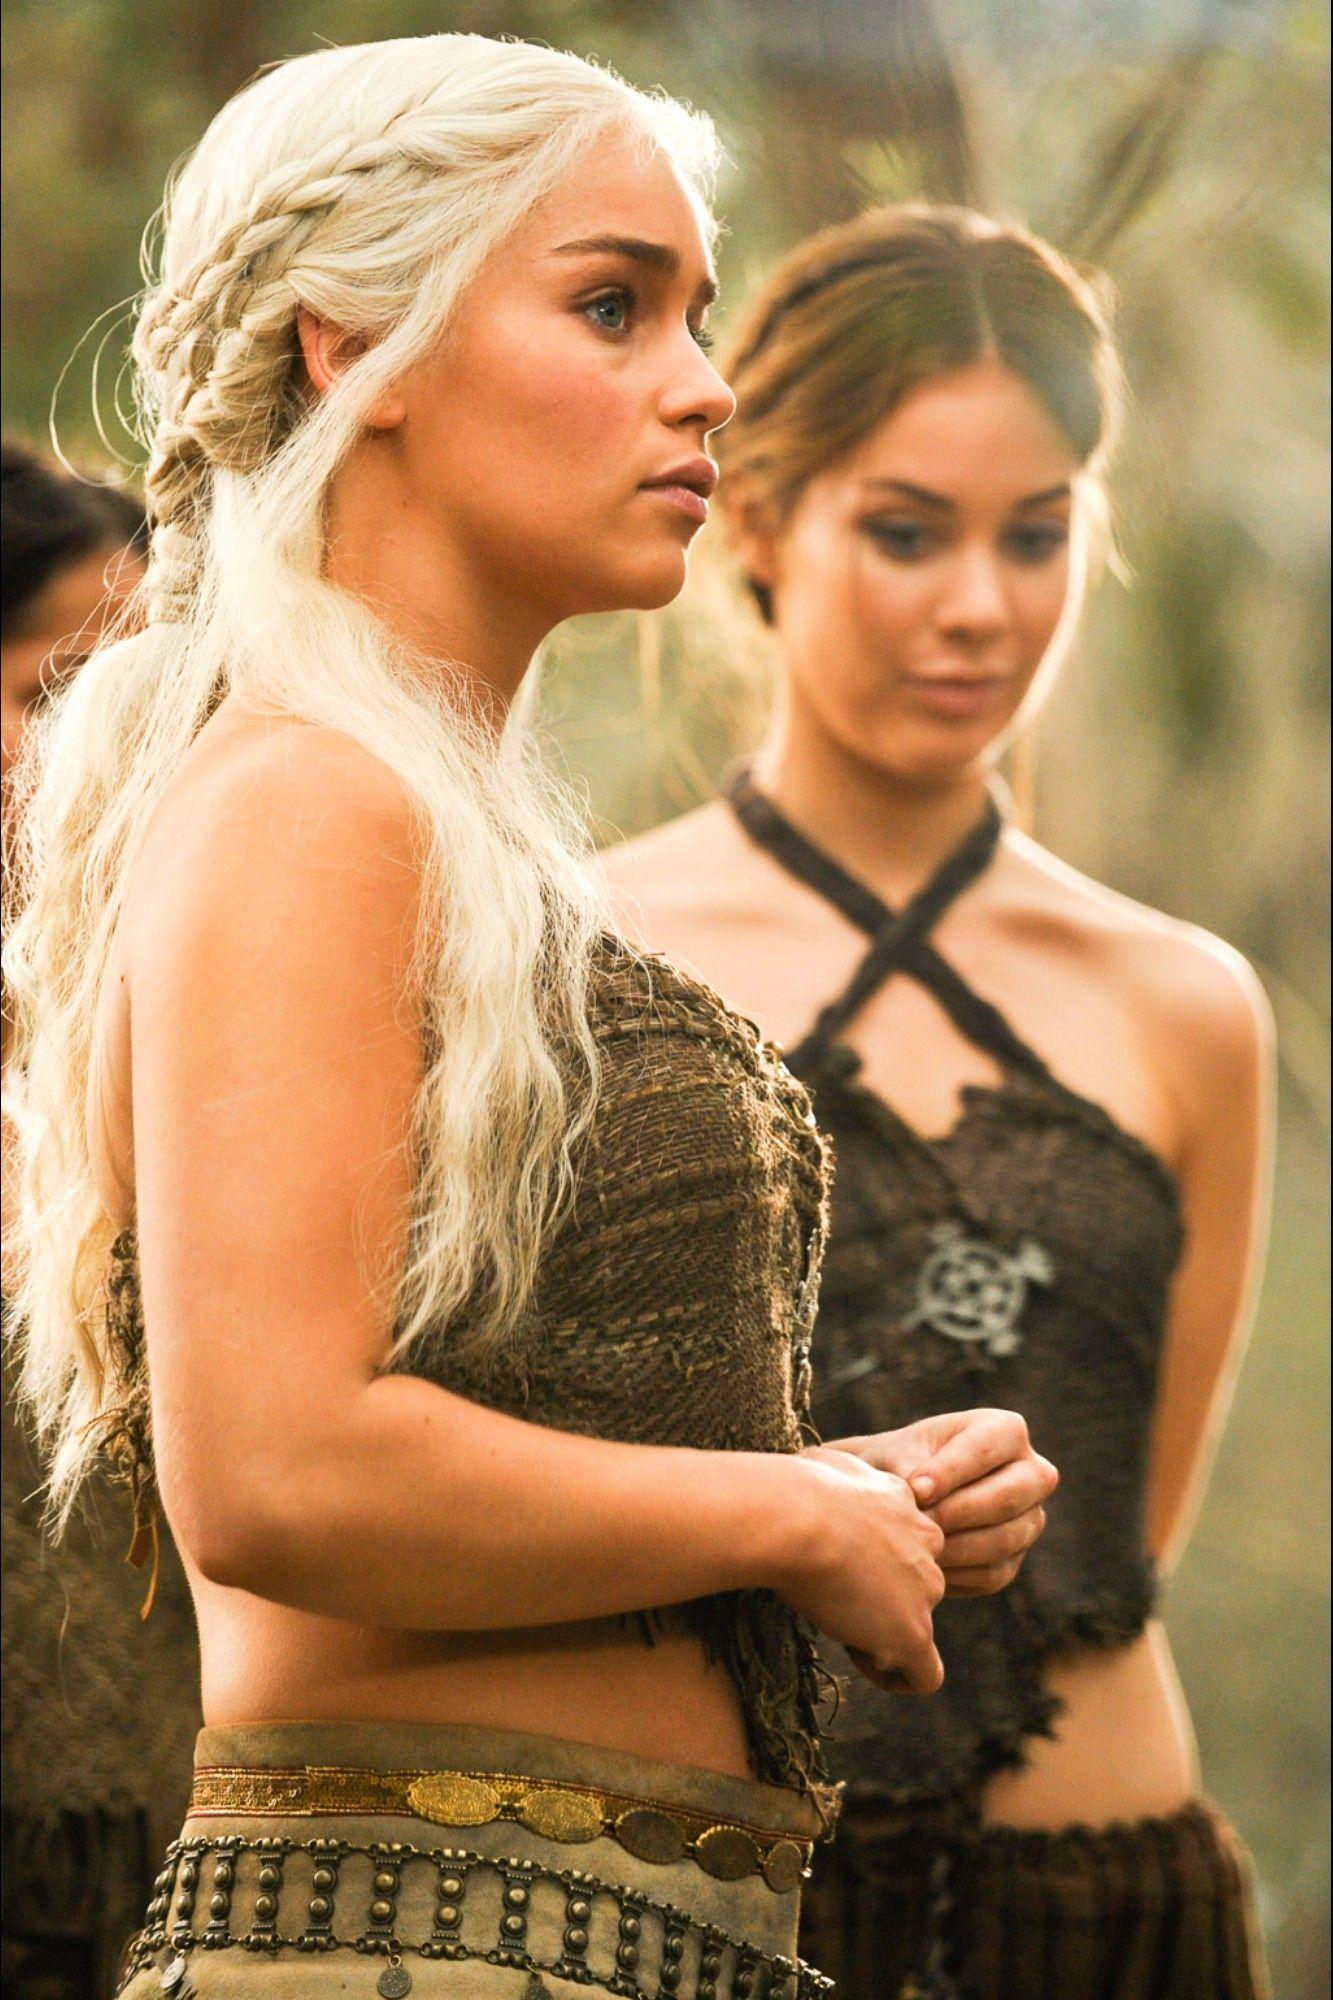 Game Of Thrones Season 1 Episode 7 : thrones, season, episode, Thrones, Season, Episode, Still, Clarke, Thrones,, Daenerys, Targaryen,, Emilia